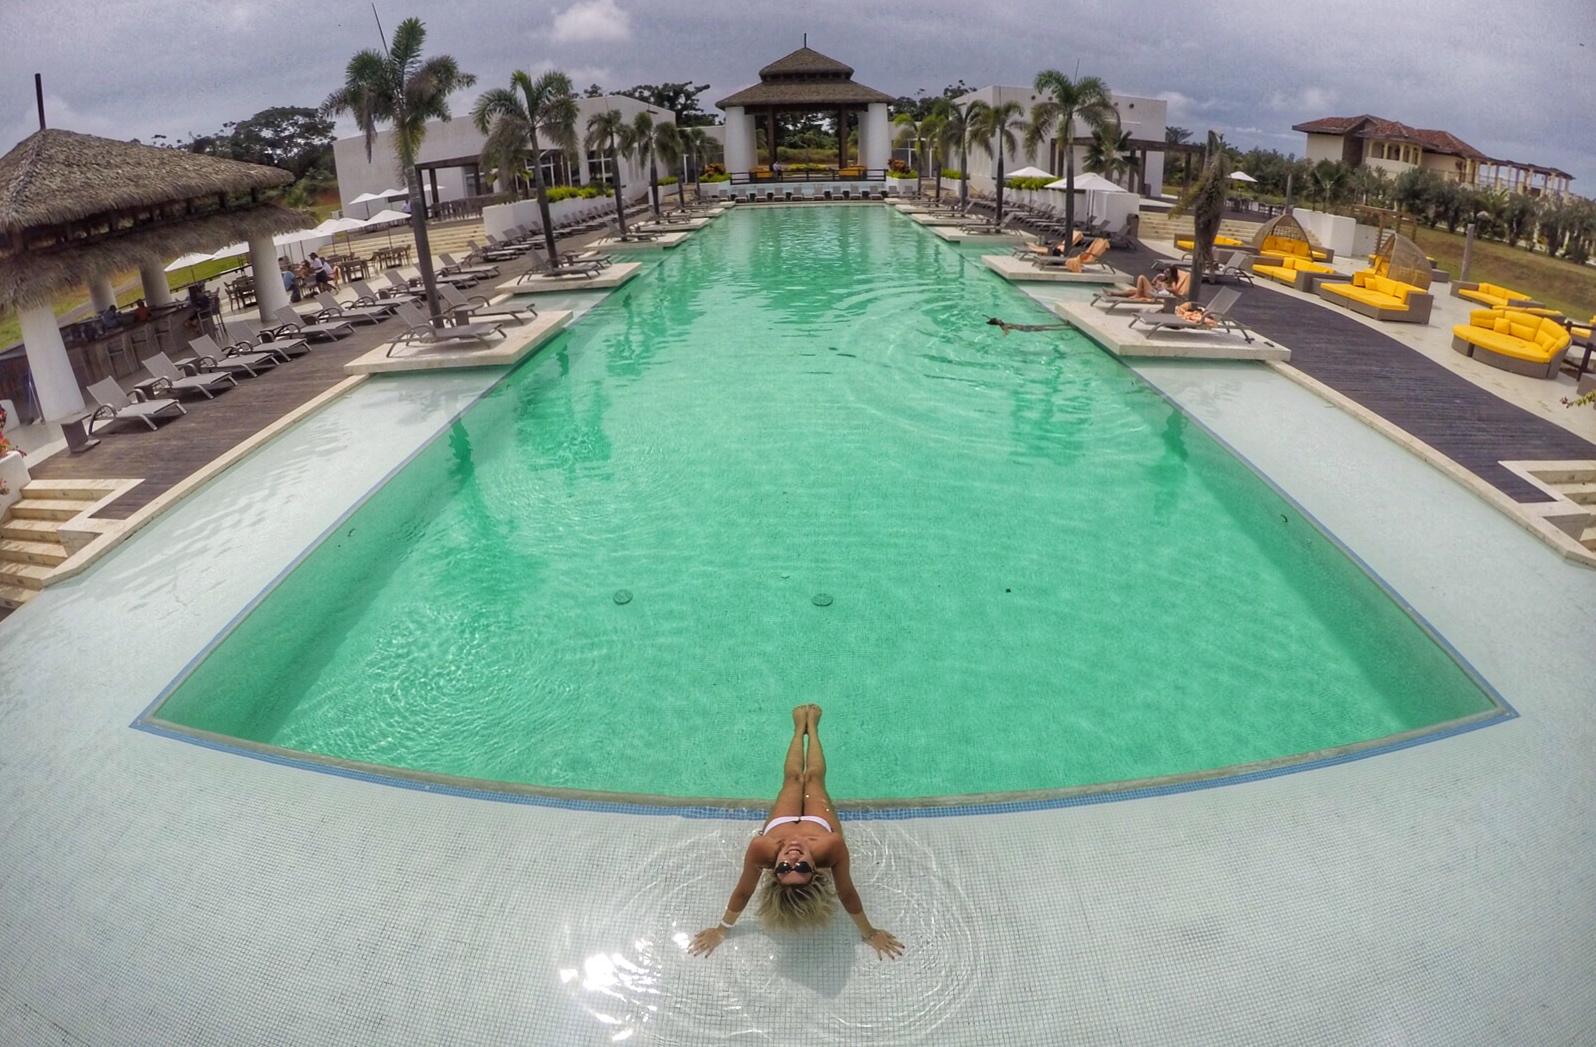 Isla Viveros Beach Club - Las Perlas - Panamá